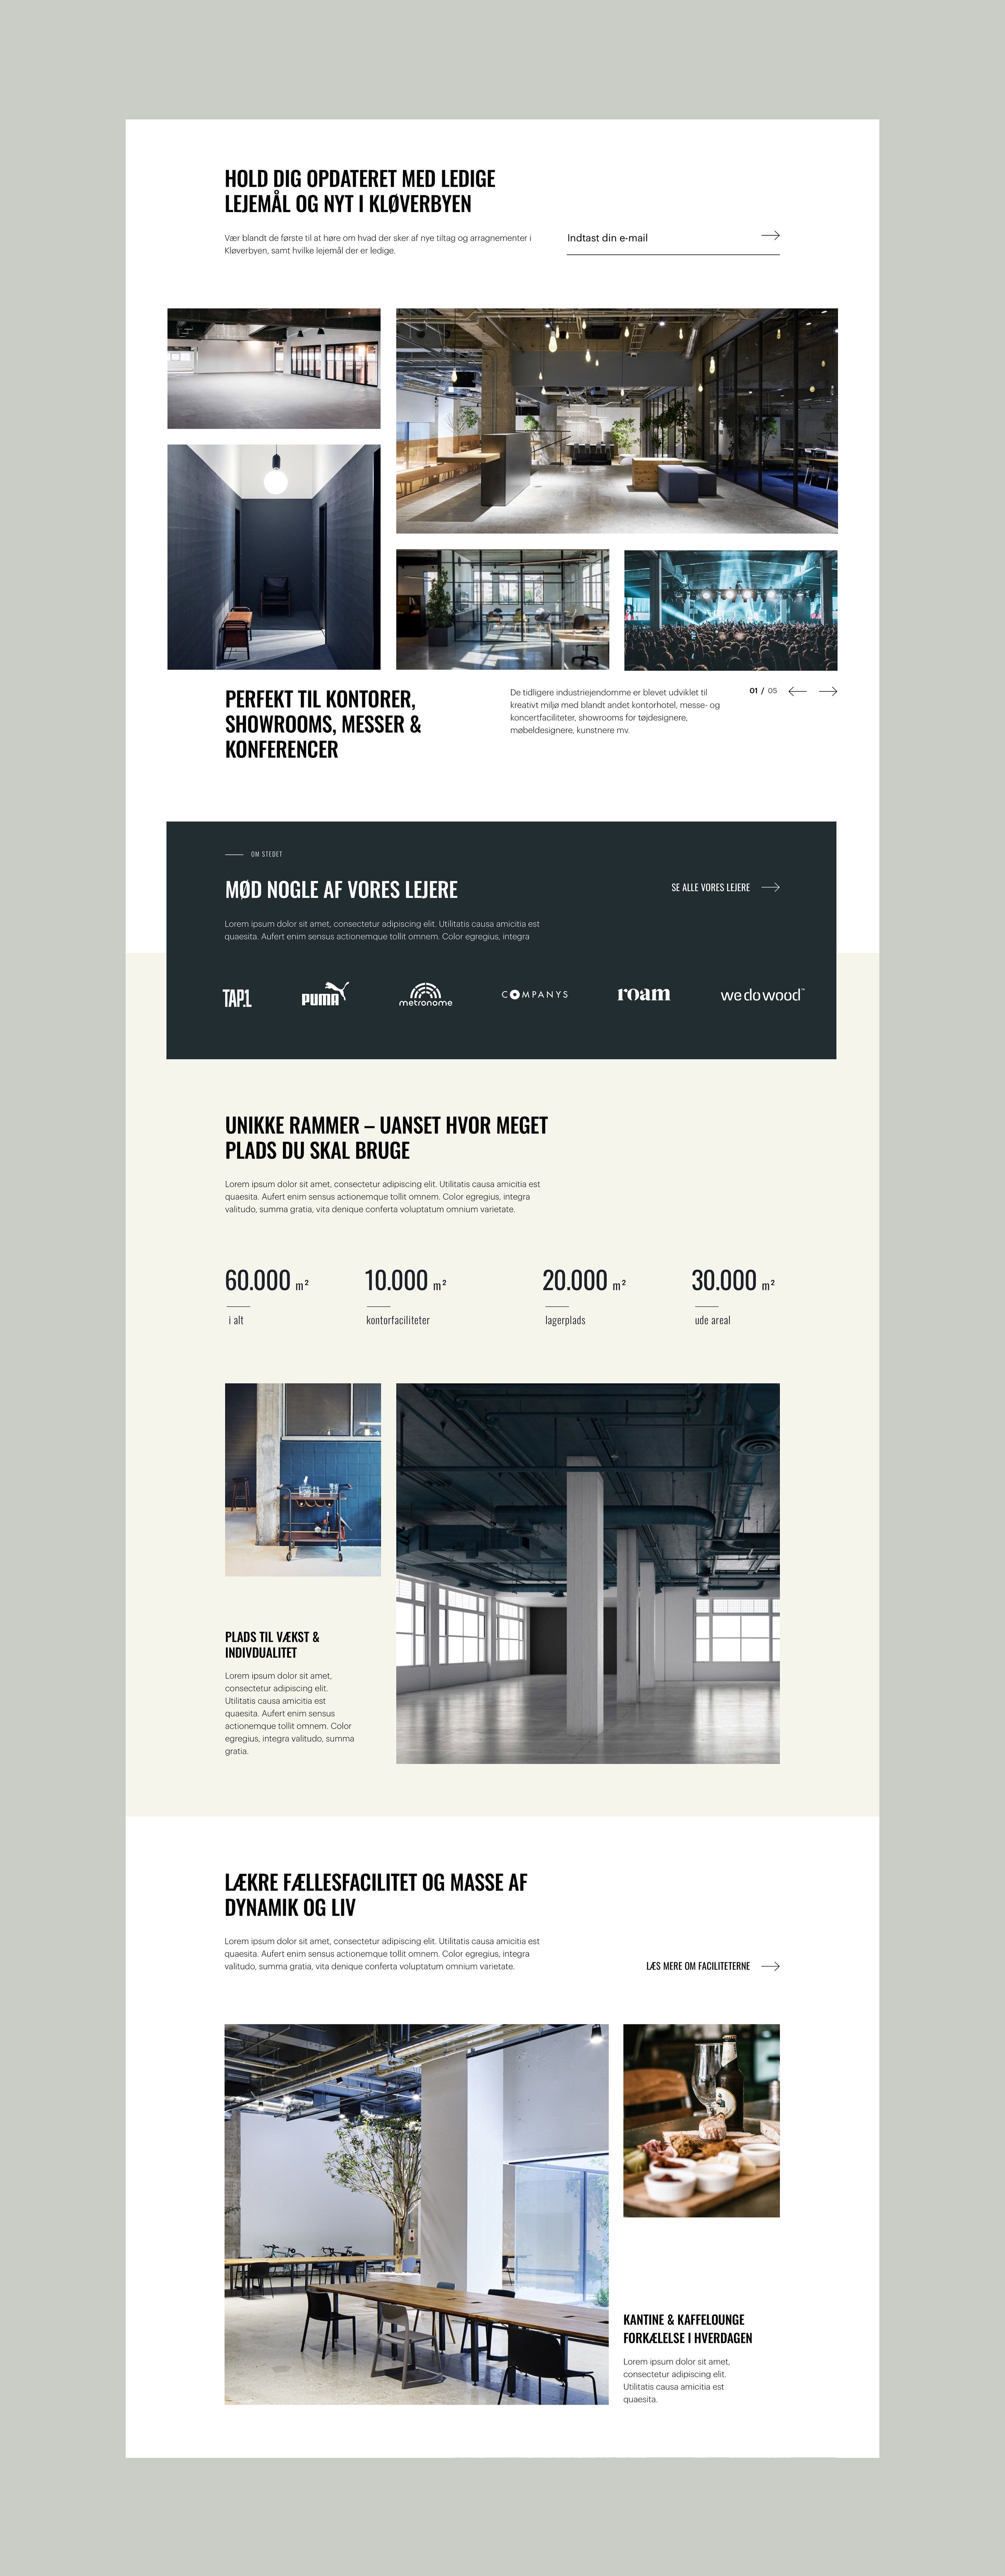 Kloverbyen On Behance Web Design Web Design Inspiration Design